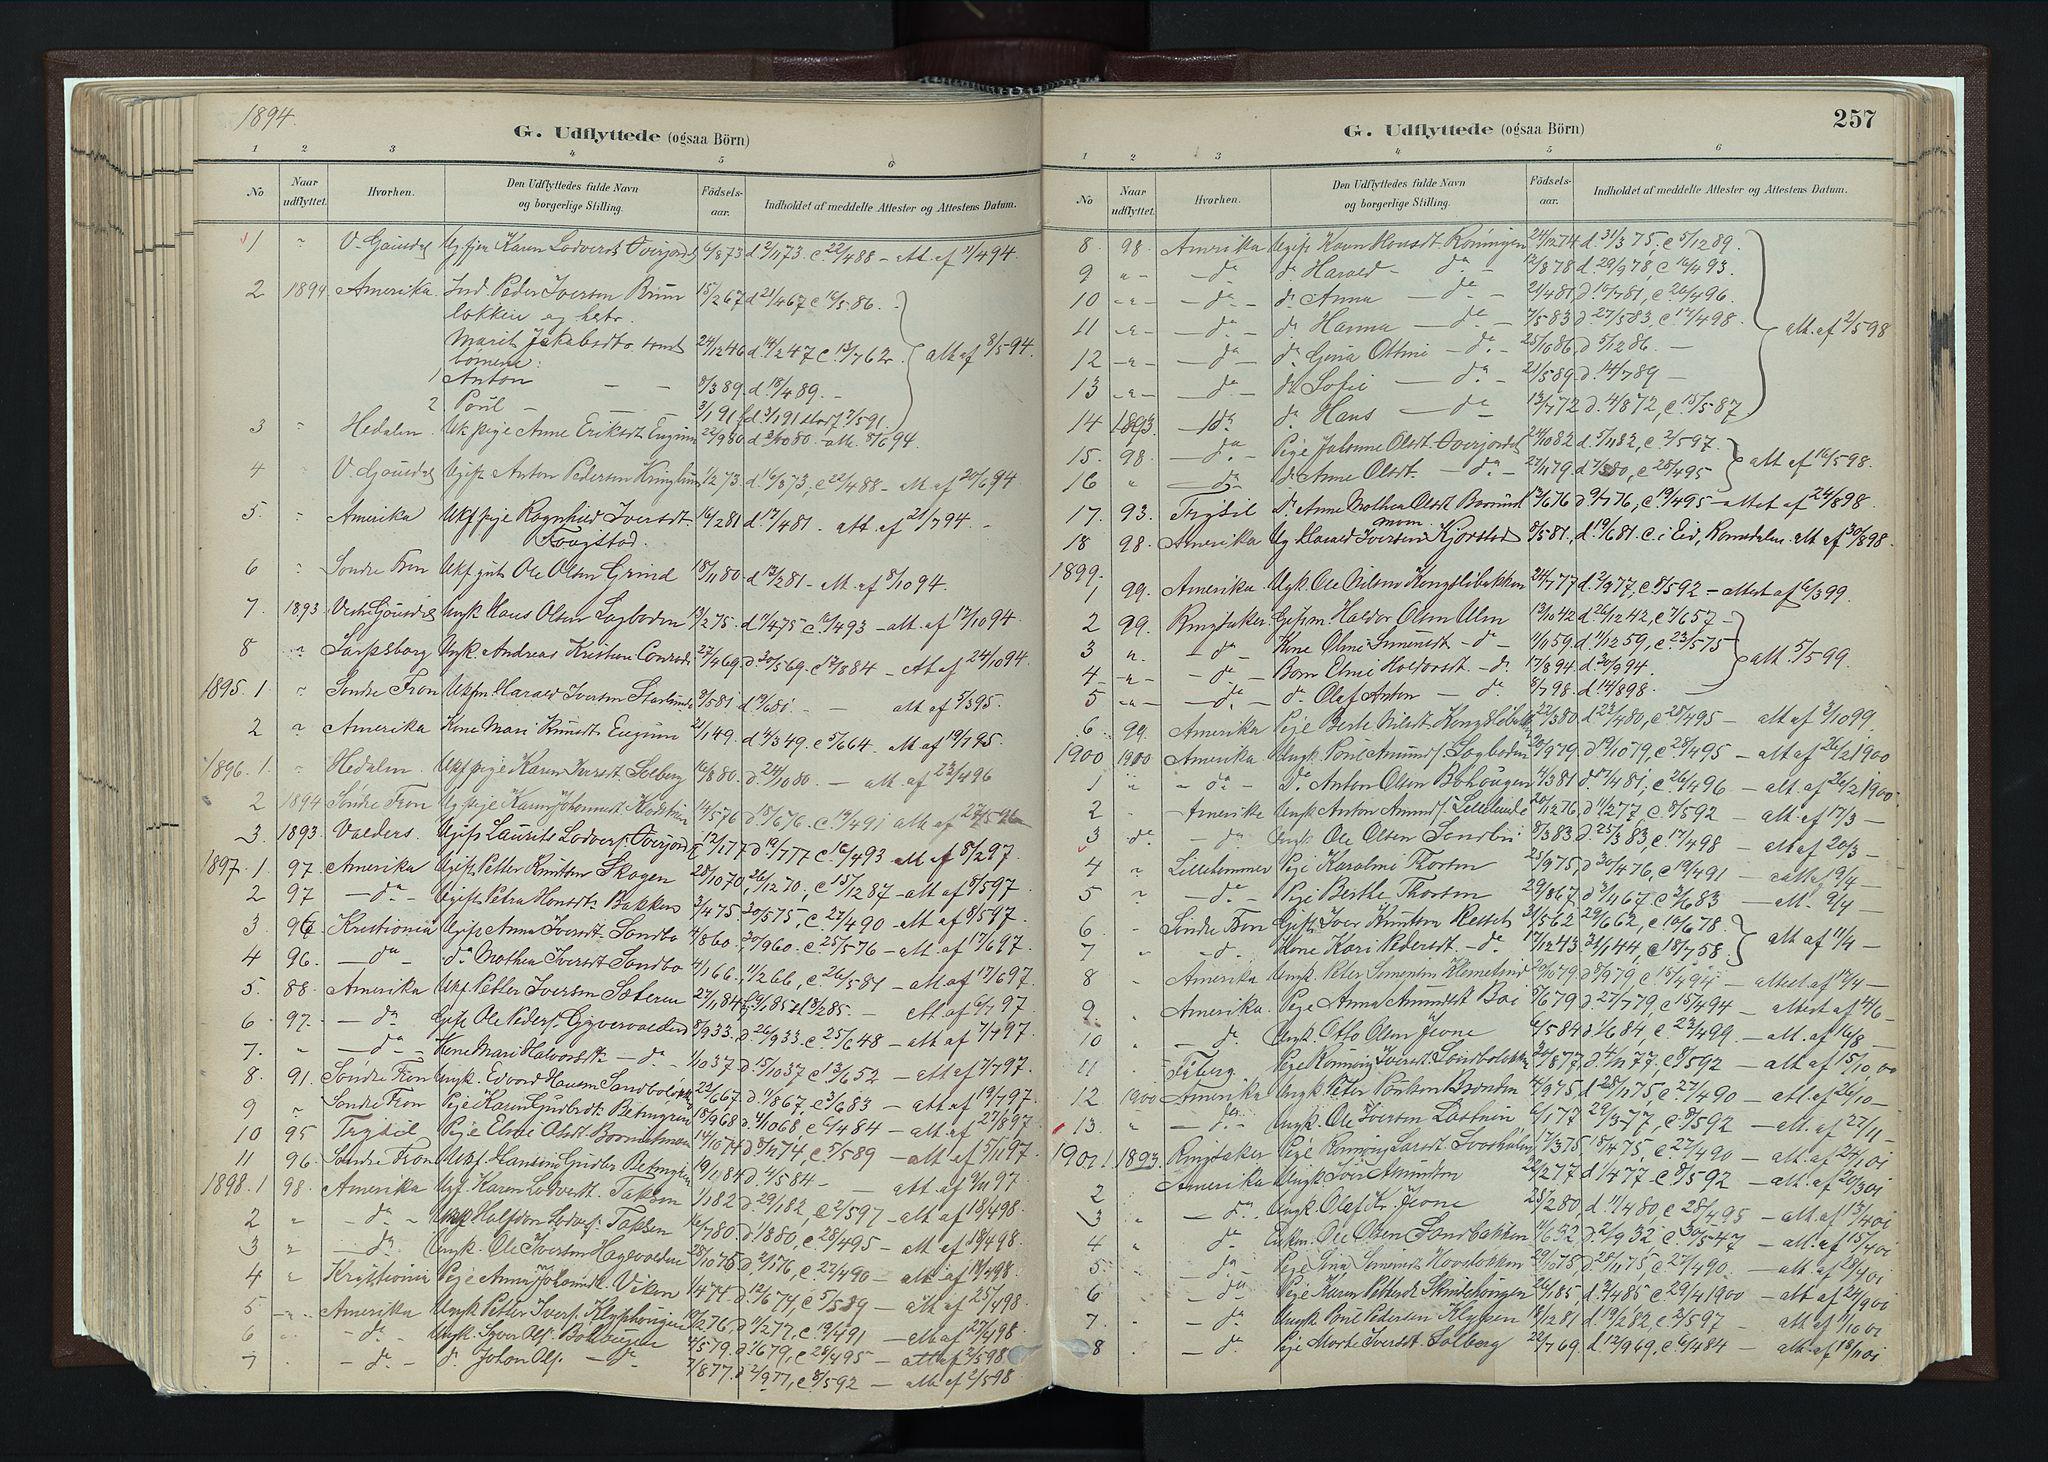 SAH, Nord-Fron prestekontor, Ministerialbok nr. 4, 1884-1914, s. 257